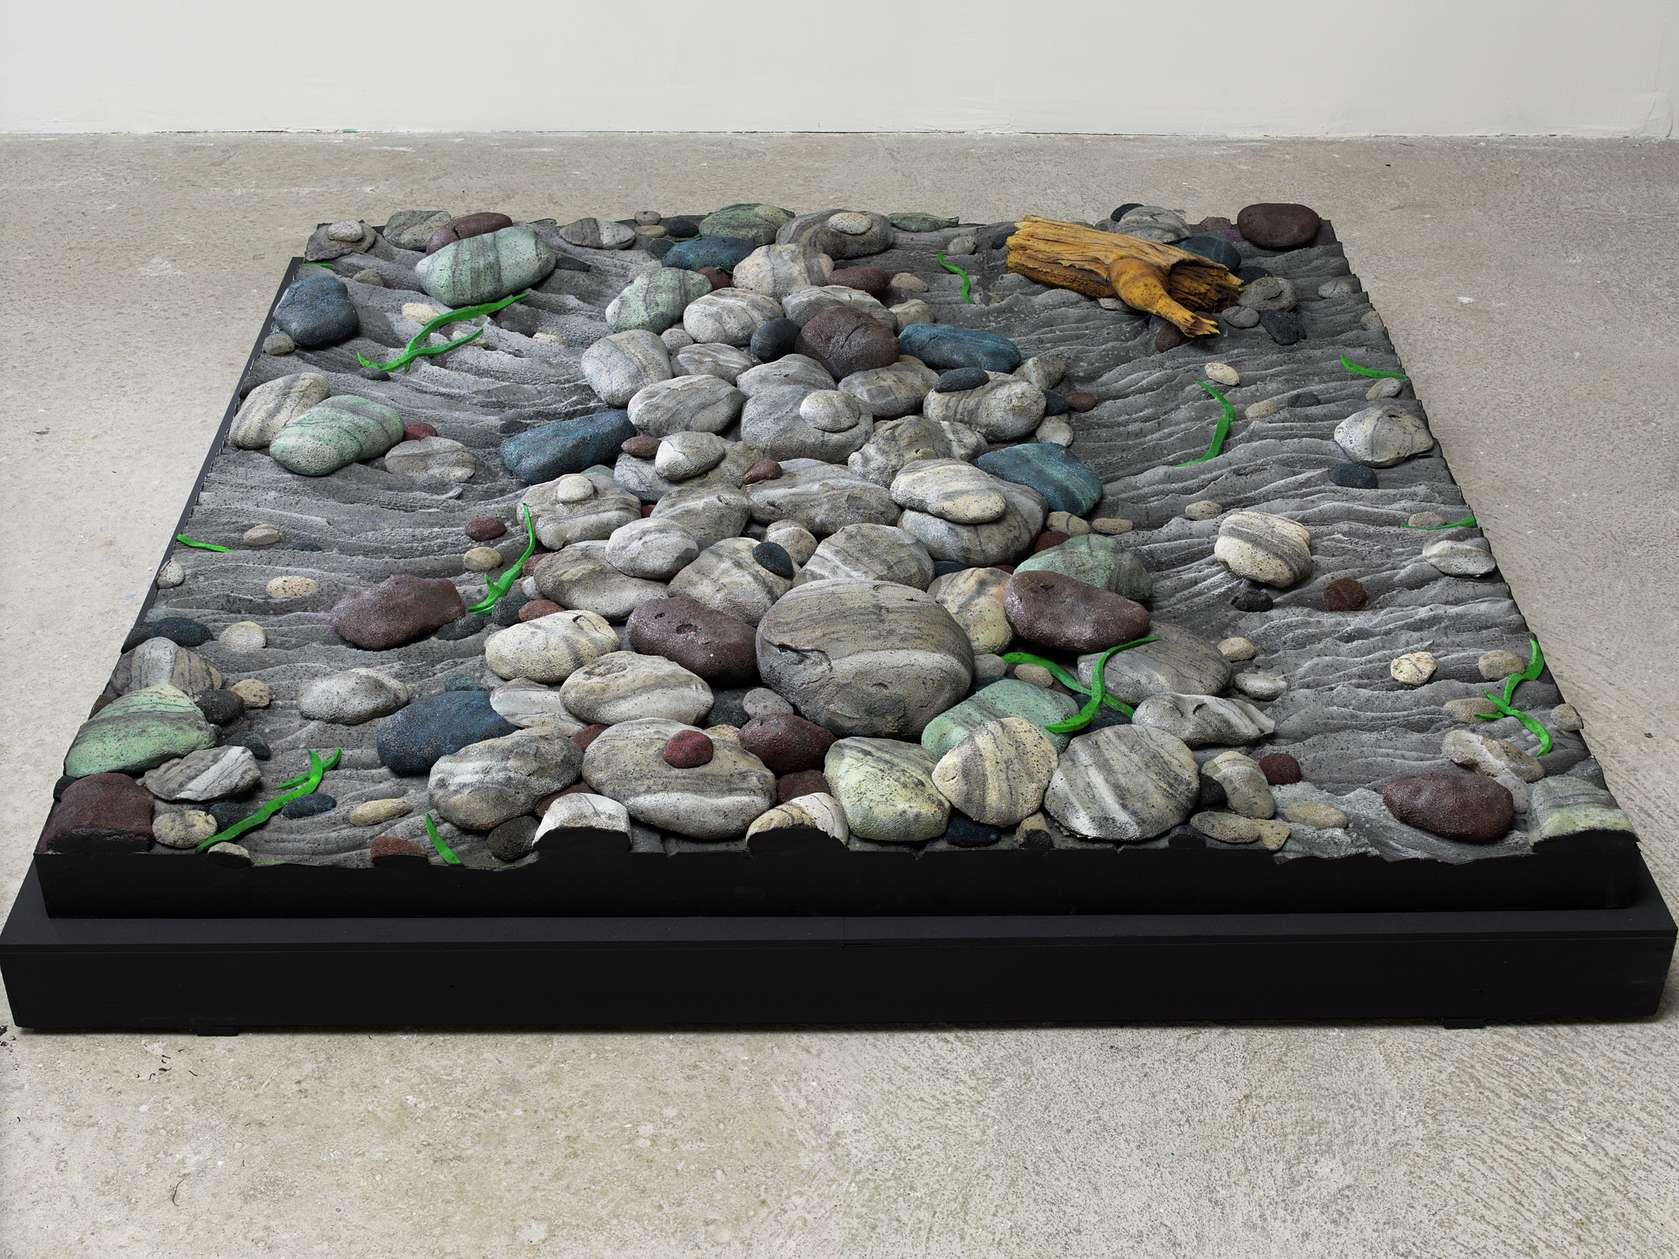 Piero Gilardi, Sassi, 1967 Mousse de polyuréthane152 x 152 x 18cm / 59 7/8 x 59 7/8 x 7 1/8inches